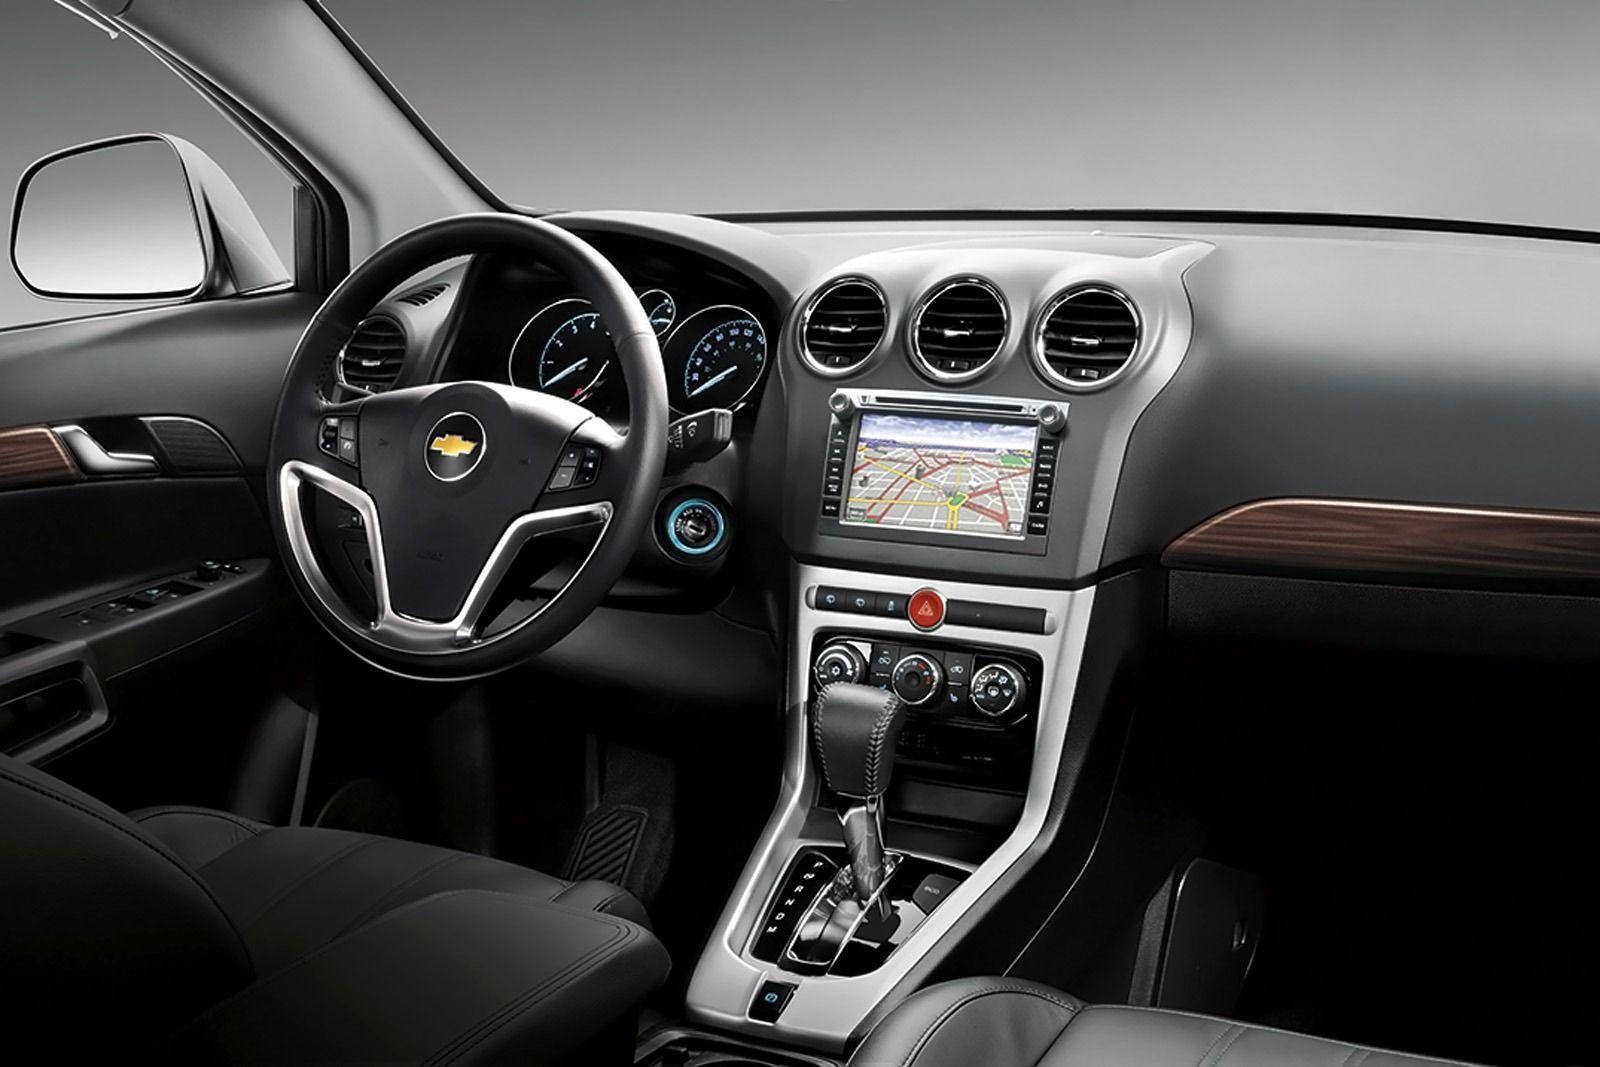 Chevrolet Sport 2014 2014 Chevrolet Captiva Sport Ls Fleet 4dr Suv W 1ls 2 4l 4cyl 6a Chevrolet Captiva Chevrolet Captiva Sport Captiva Sport